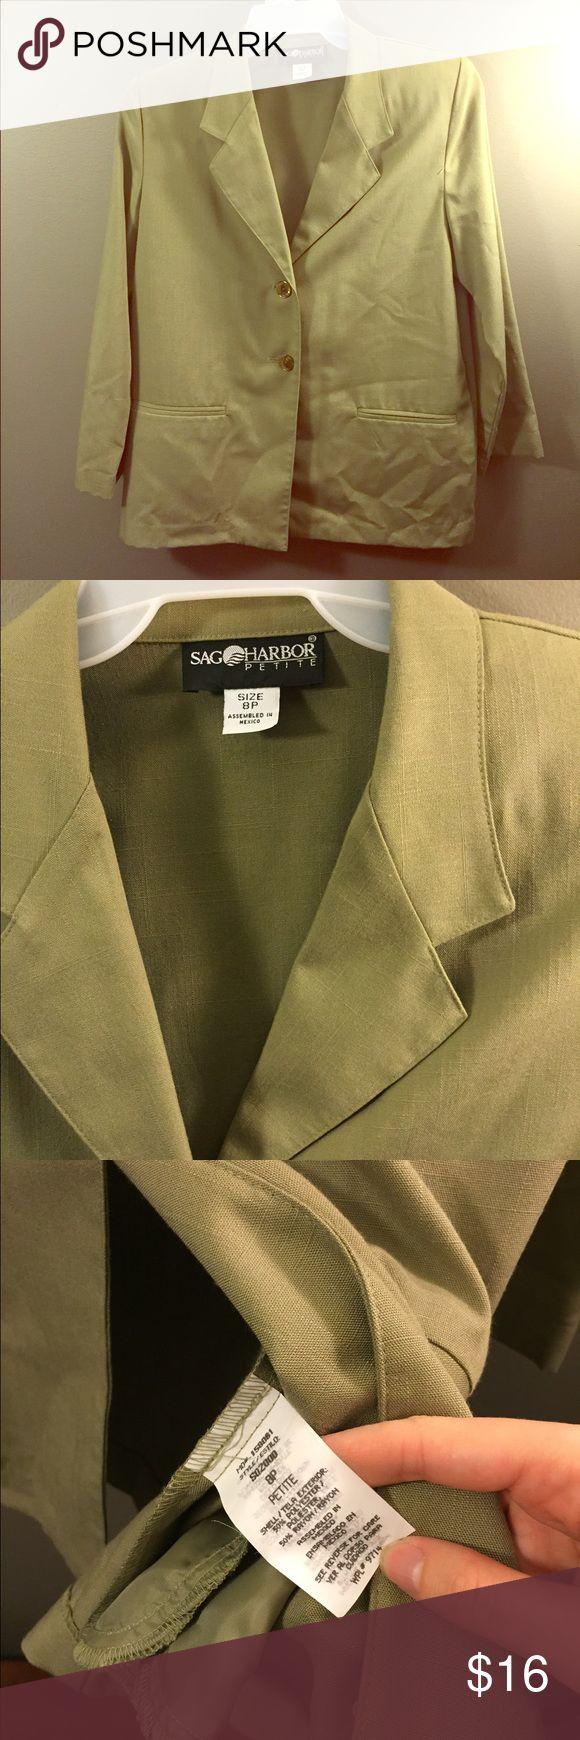 Sag Harbor Sage Green Petite Blazer Jacket 8 ☀️ Excellent condition! Thank you for looking!  #ygwyt002 Sag Harbor Jackets & Coats Blazers